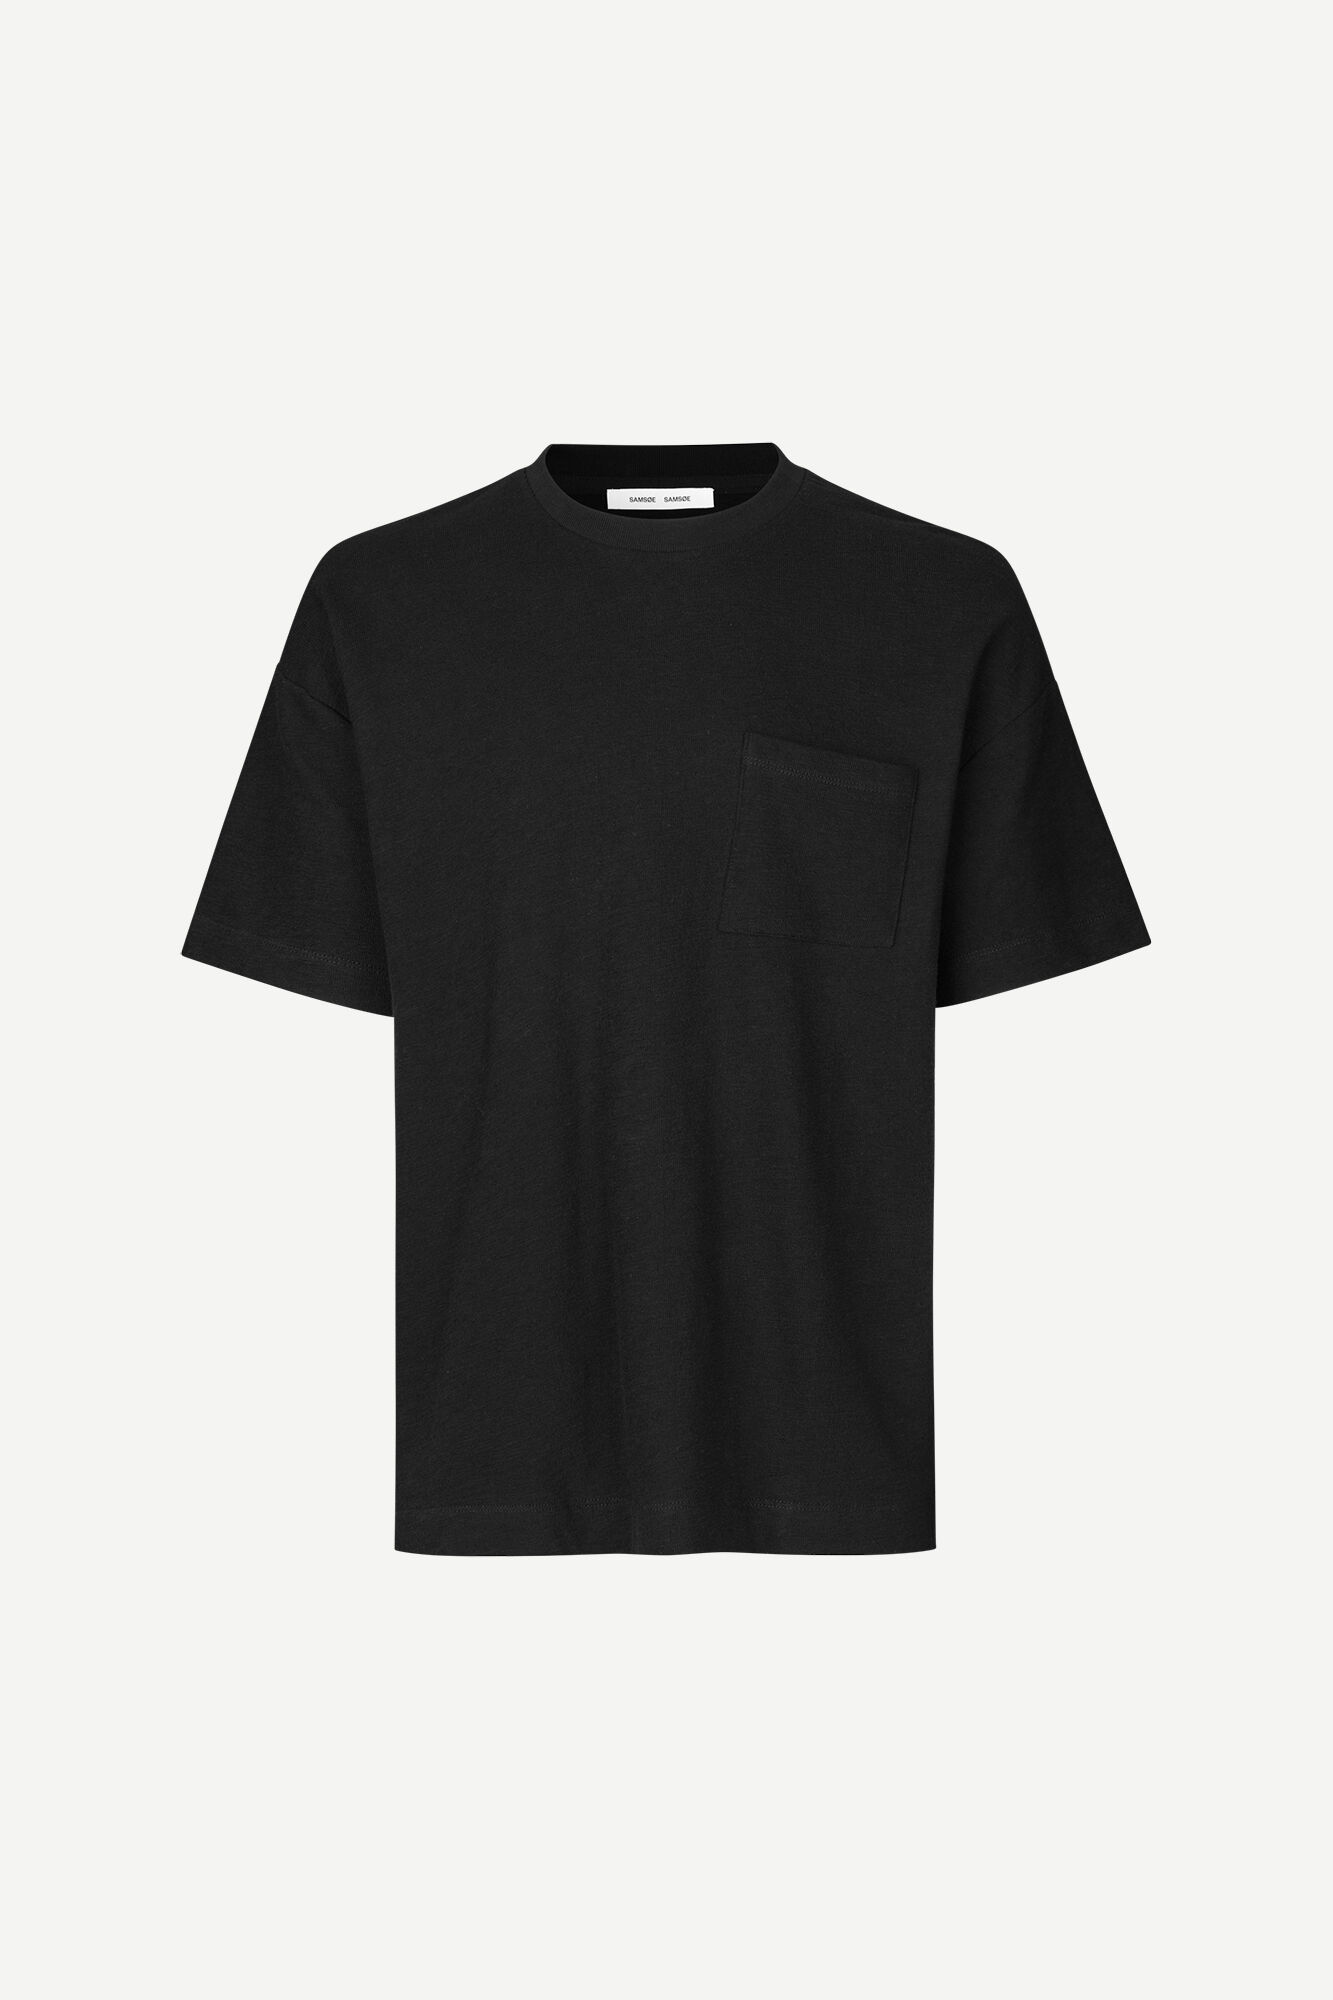 Ratano t-shirt 11411